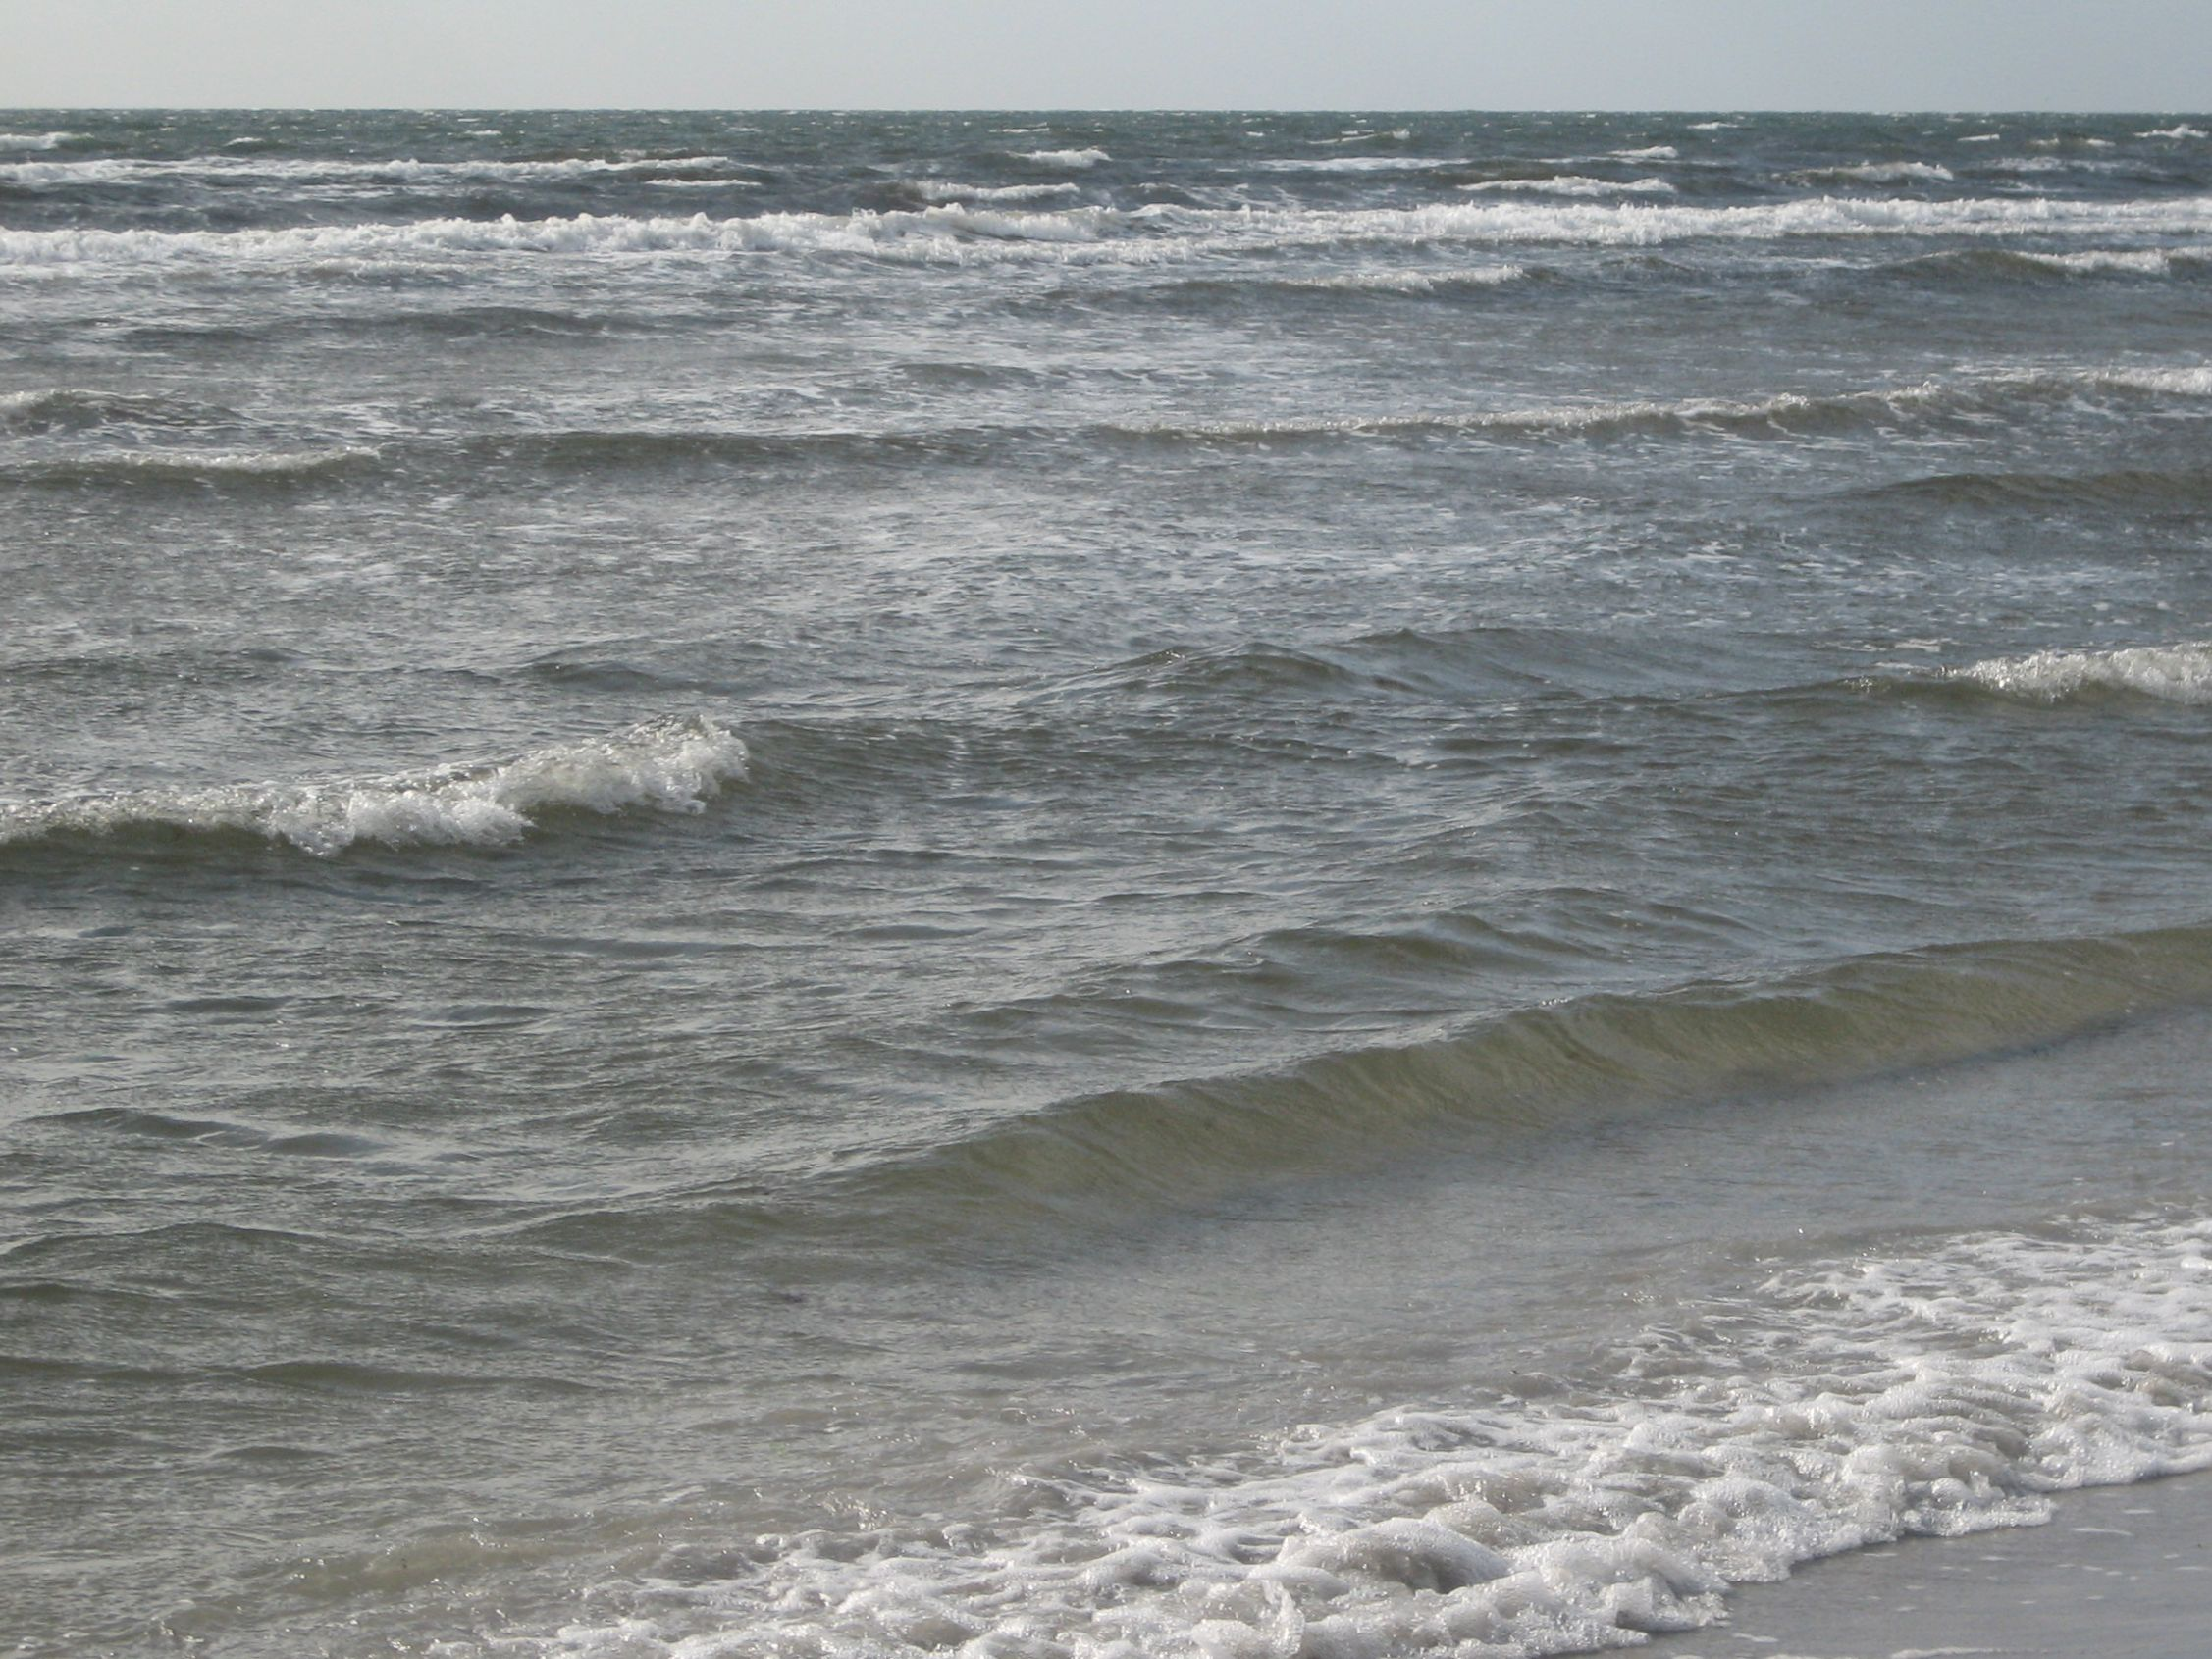 Havets horisont